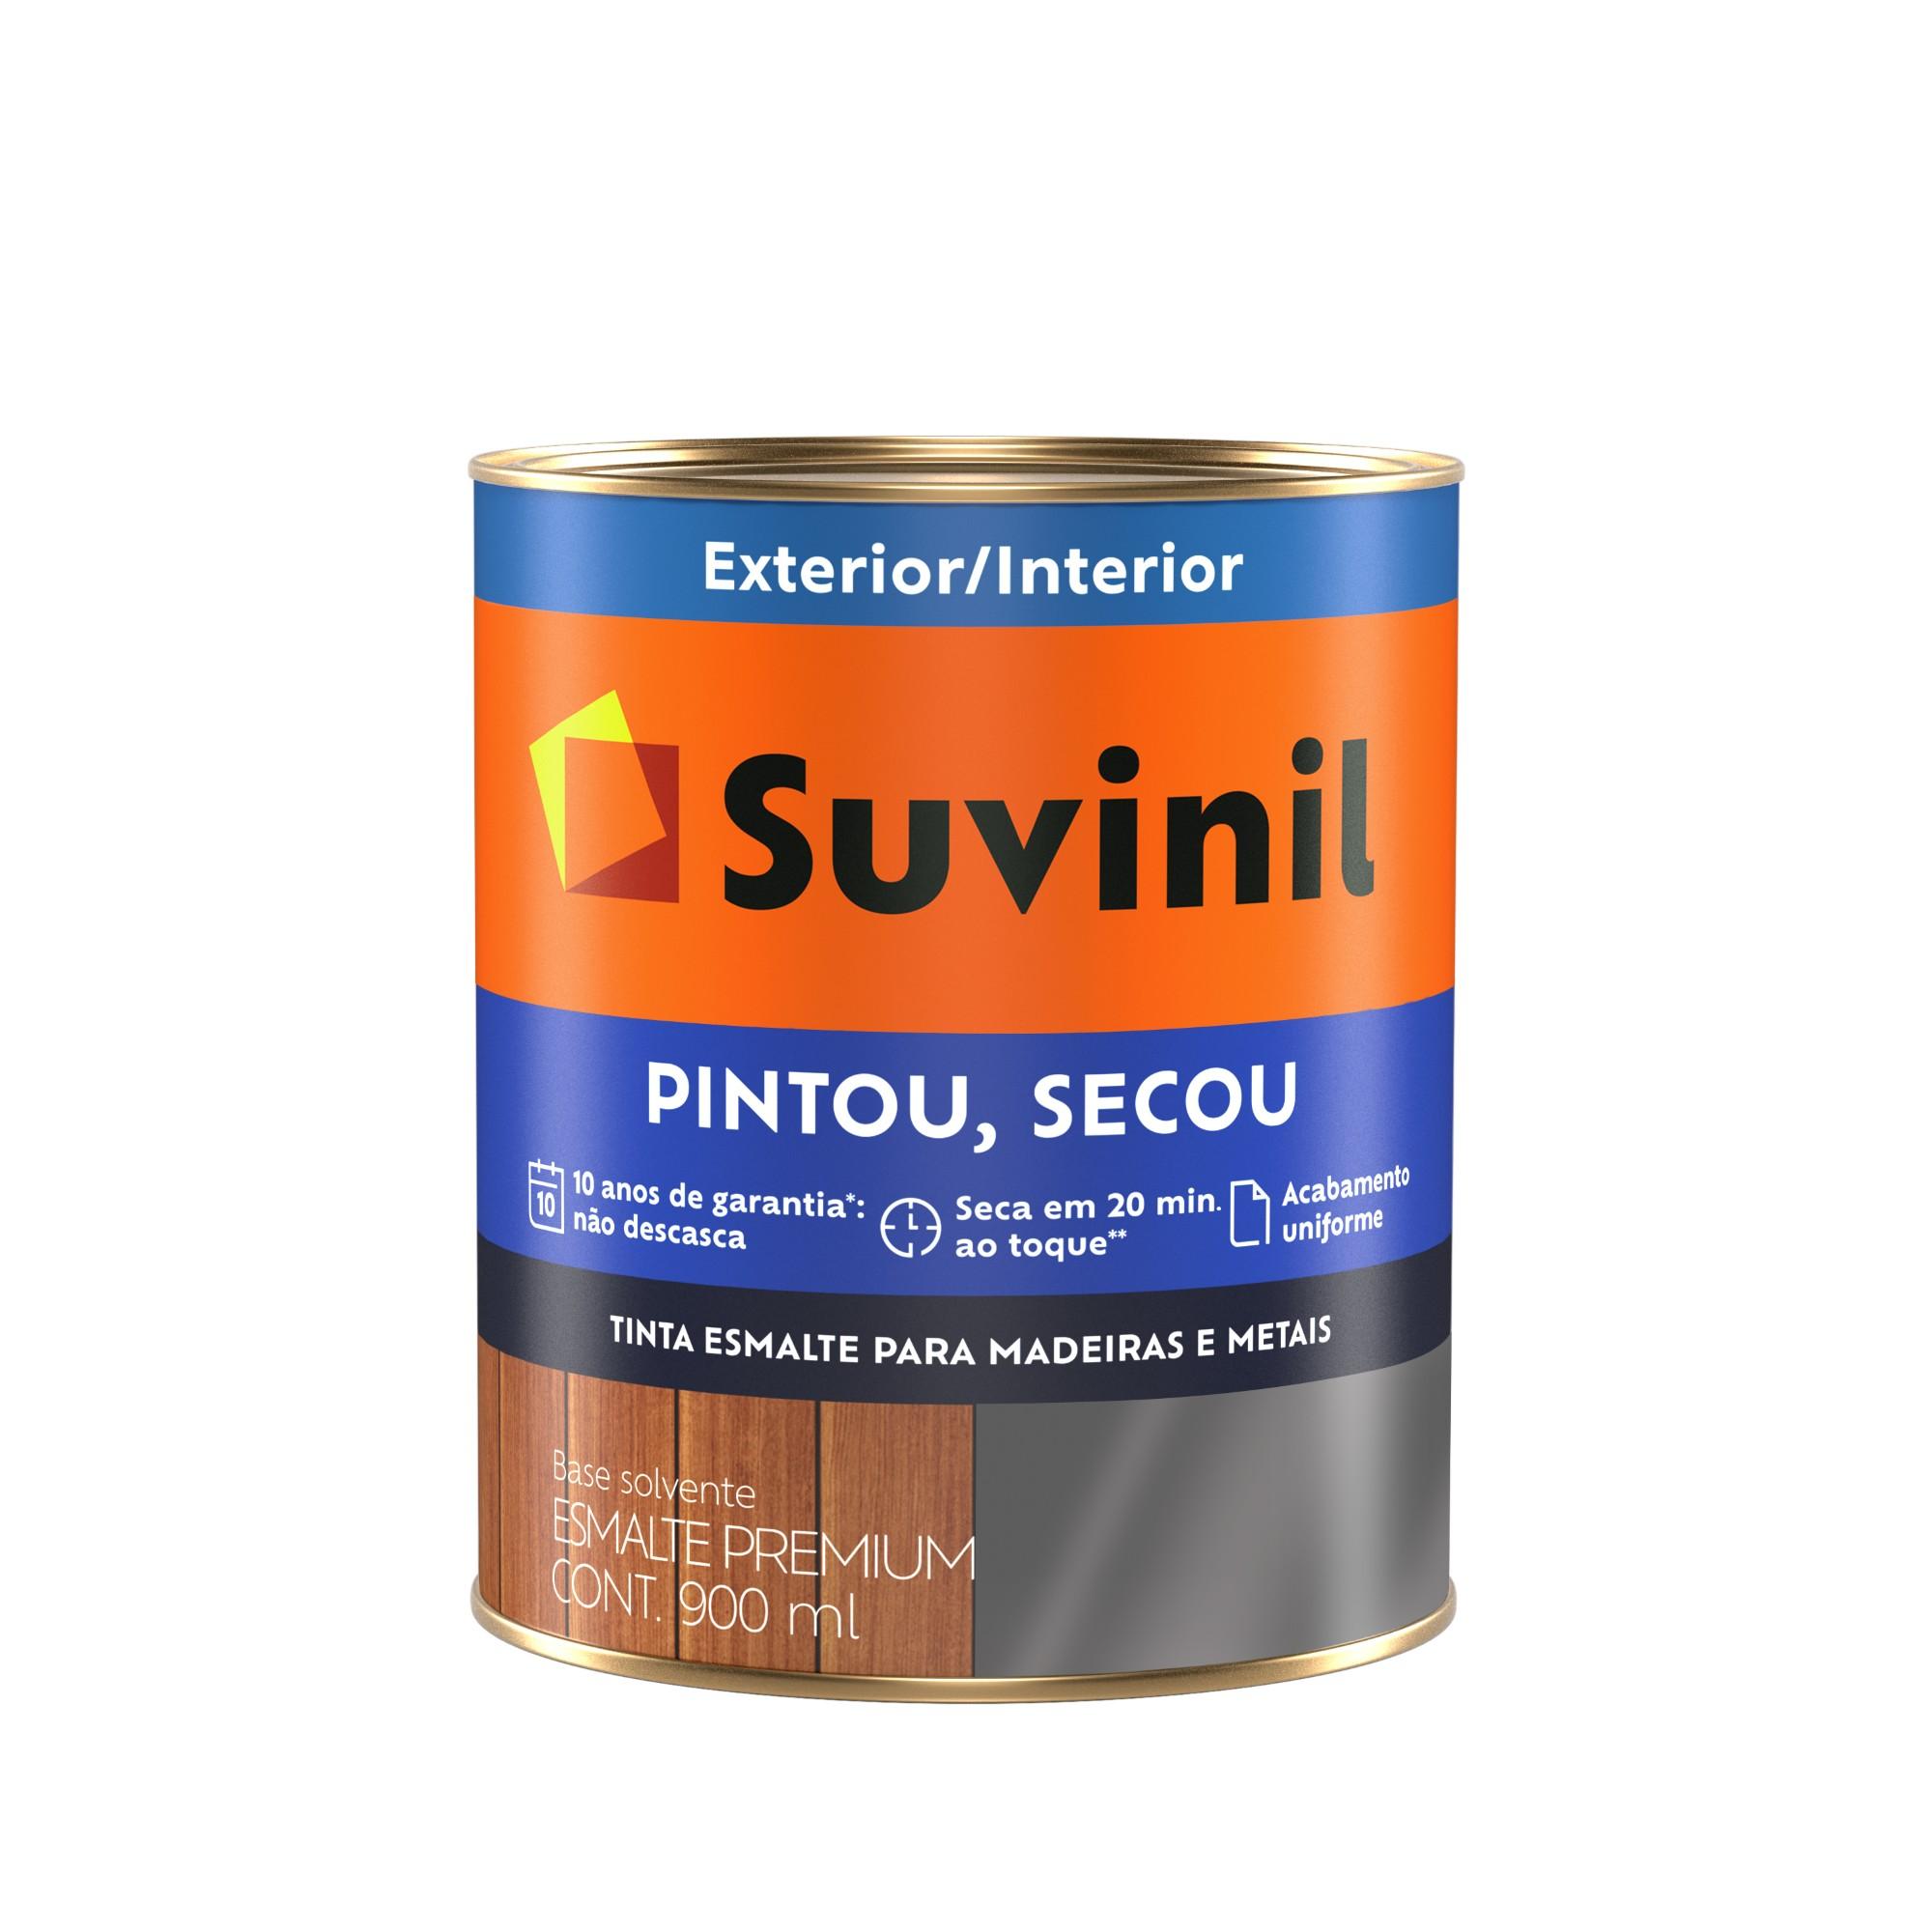 Tinta Esmalte Sintetico Brilhante Premium 09L - Platina - Pintou Secou Suvinil